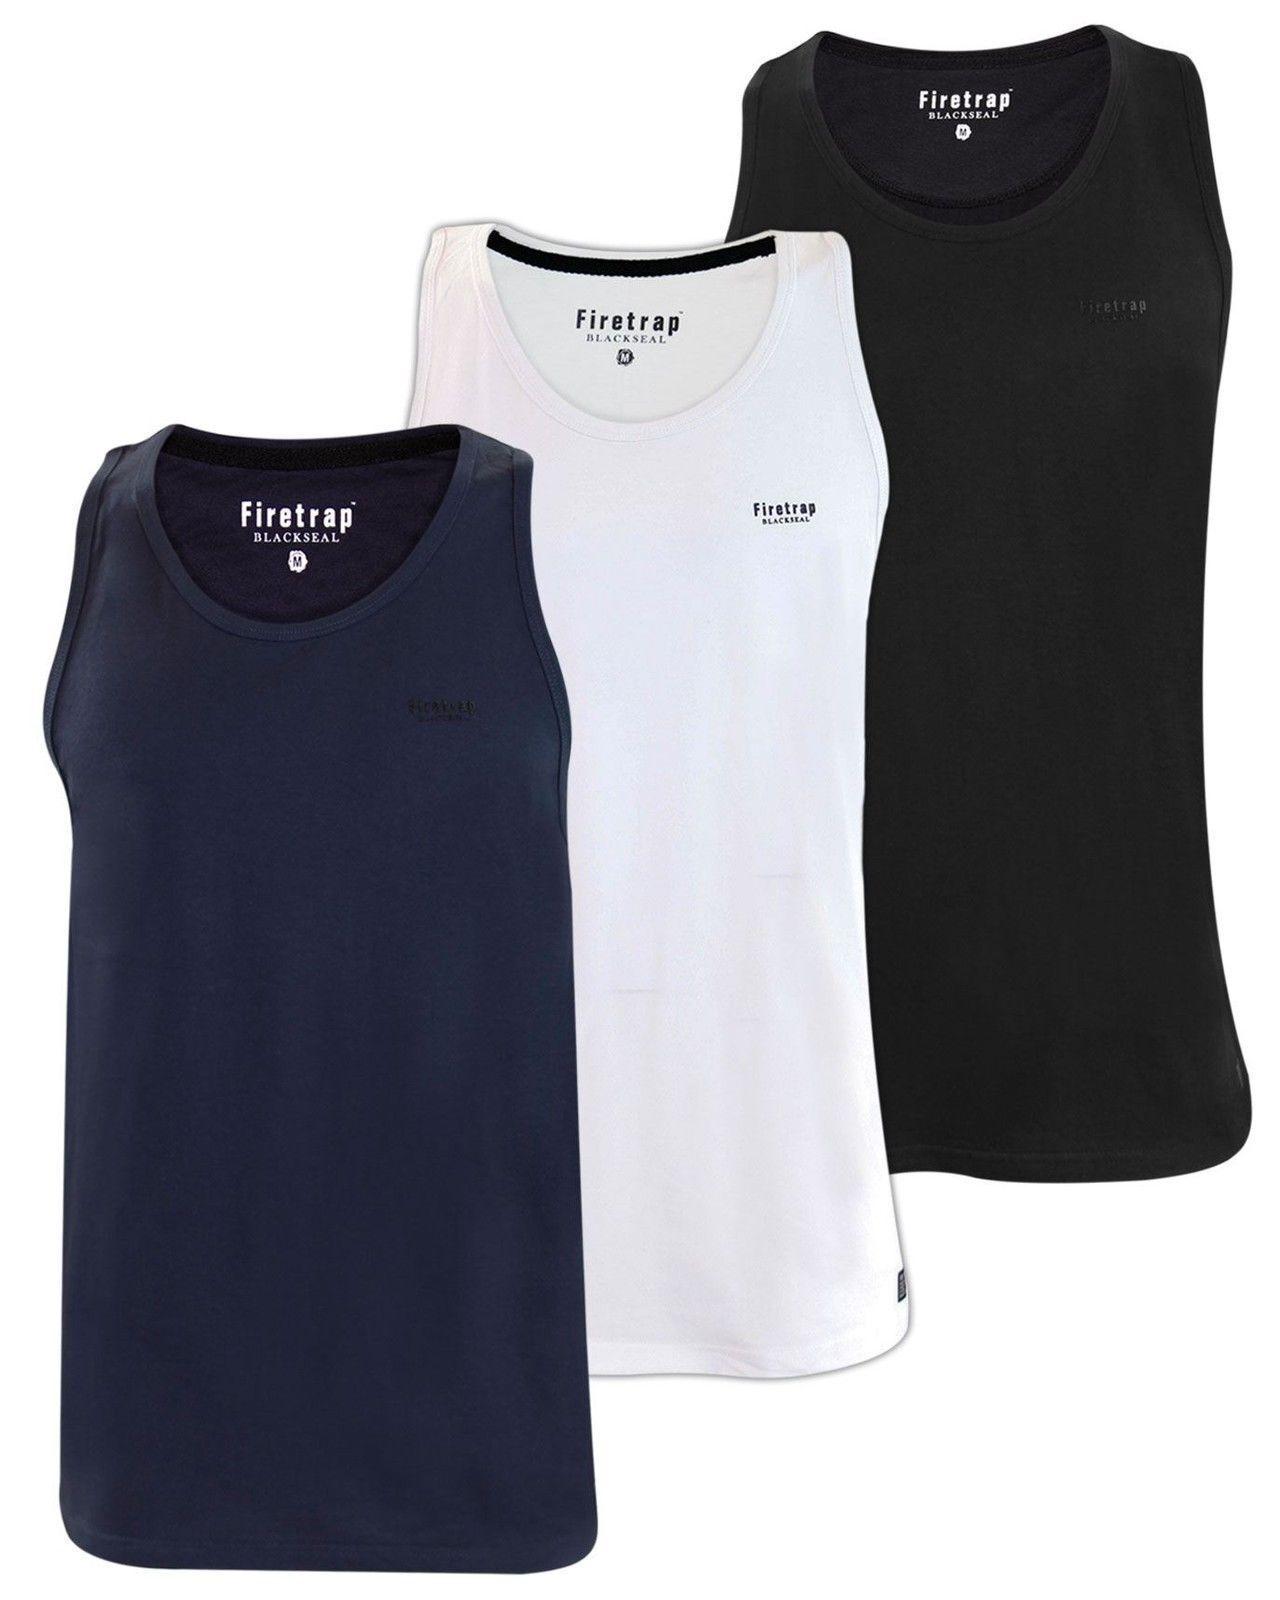 Firetrap Mens Sport Vest Cotton tank Summer Sleeveless Running Training Gym Top